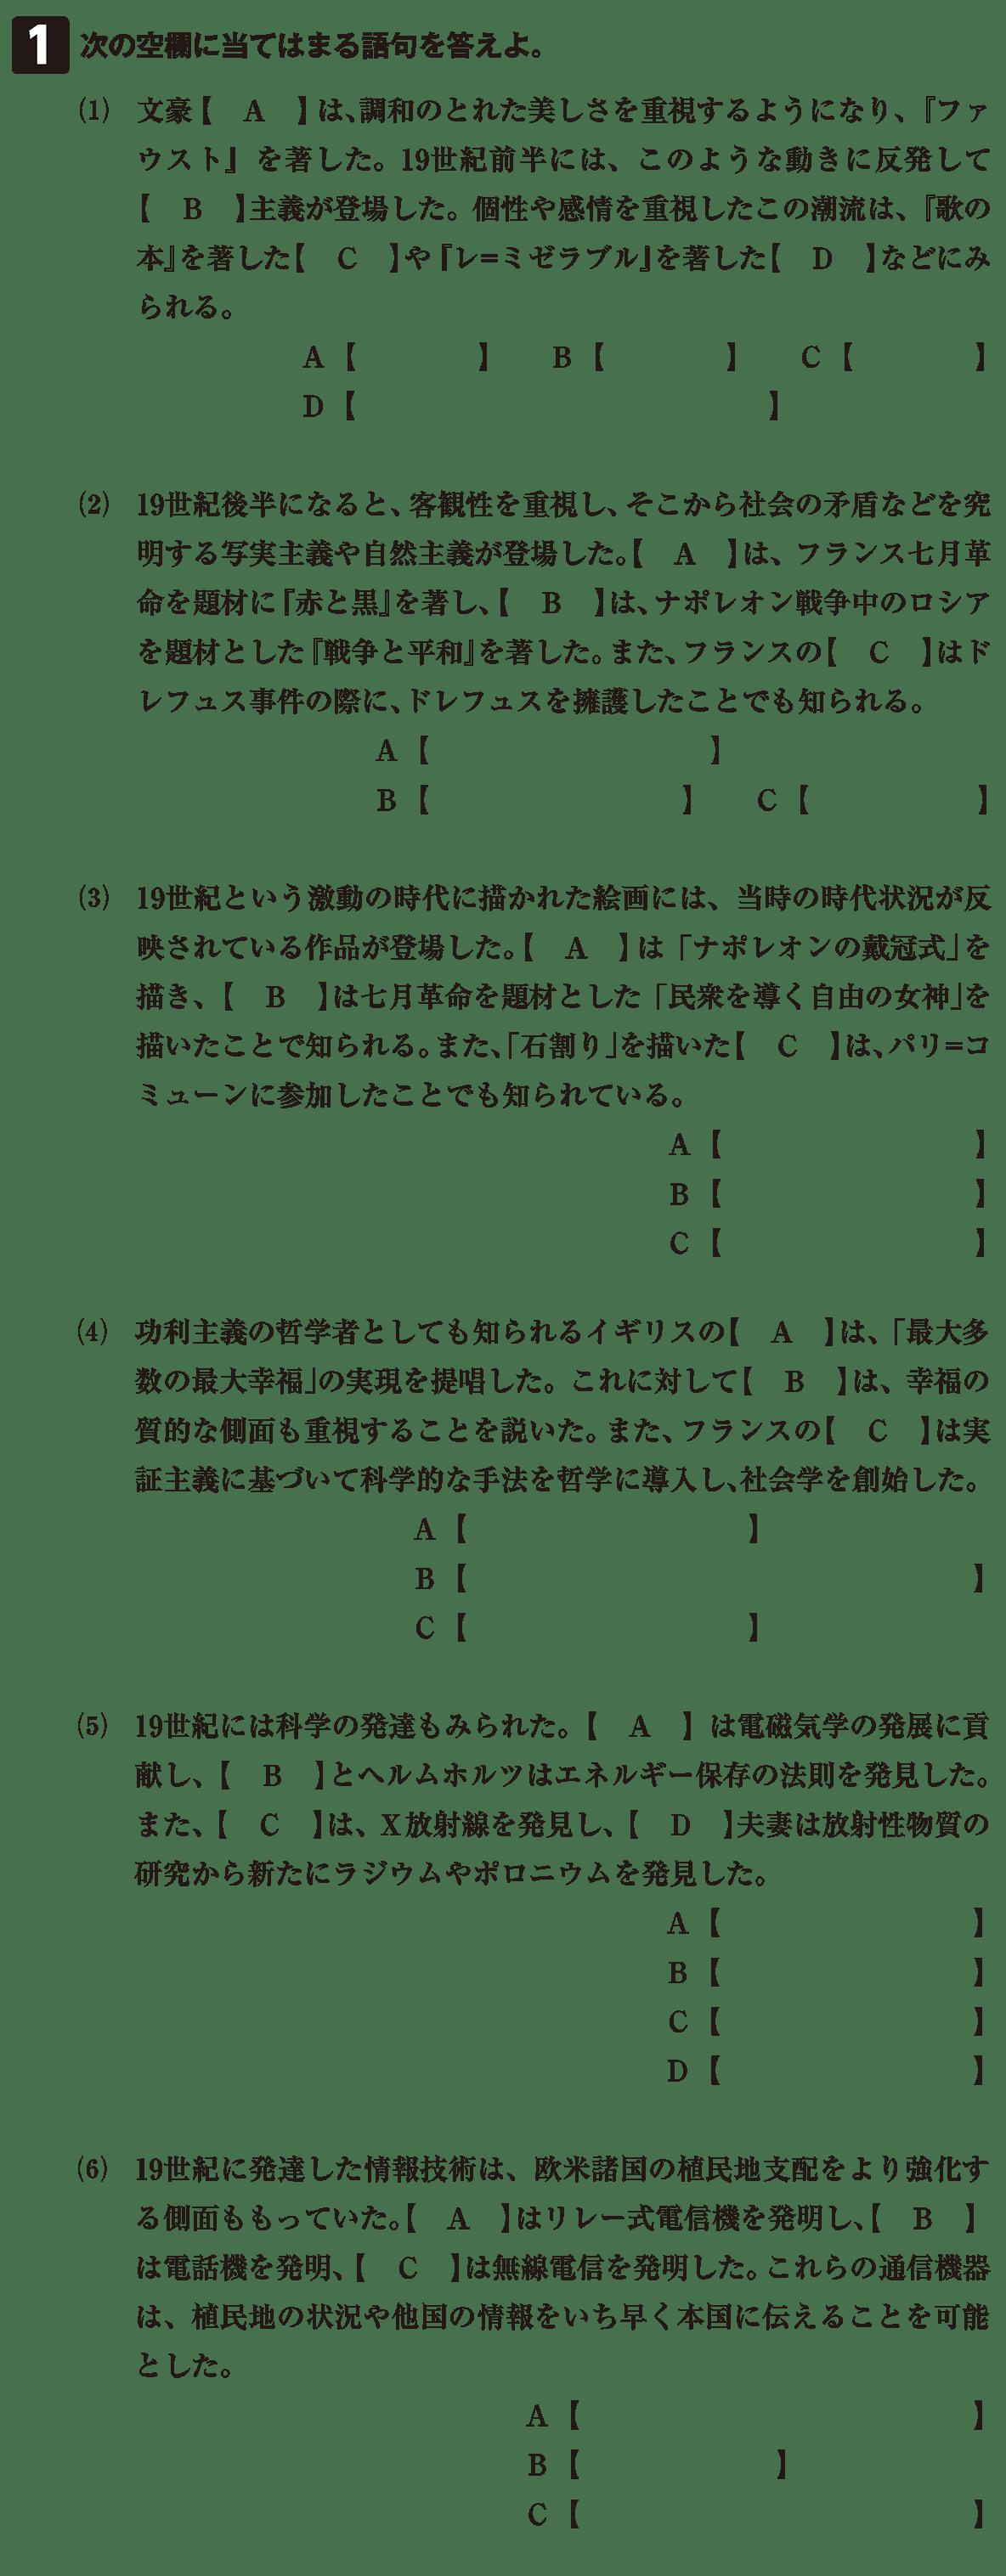 19世紀の欧米諸国(3)19世紀の欧米文化5 確認テスト(前半)